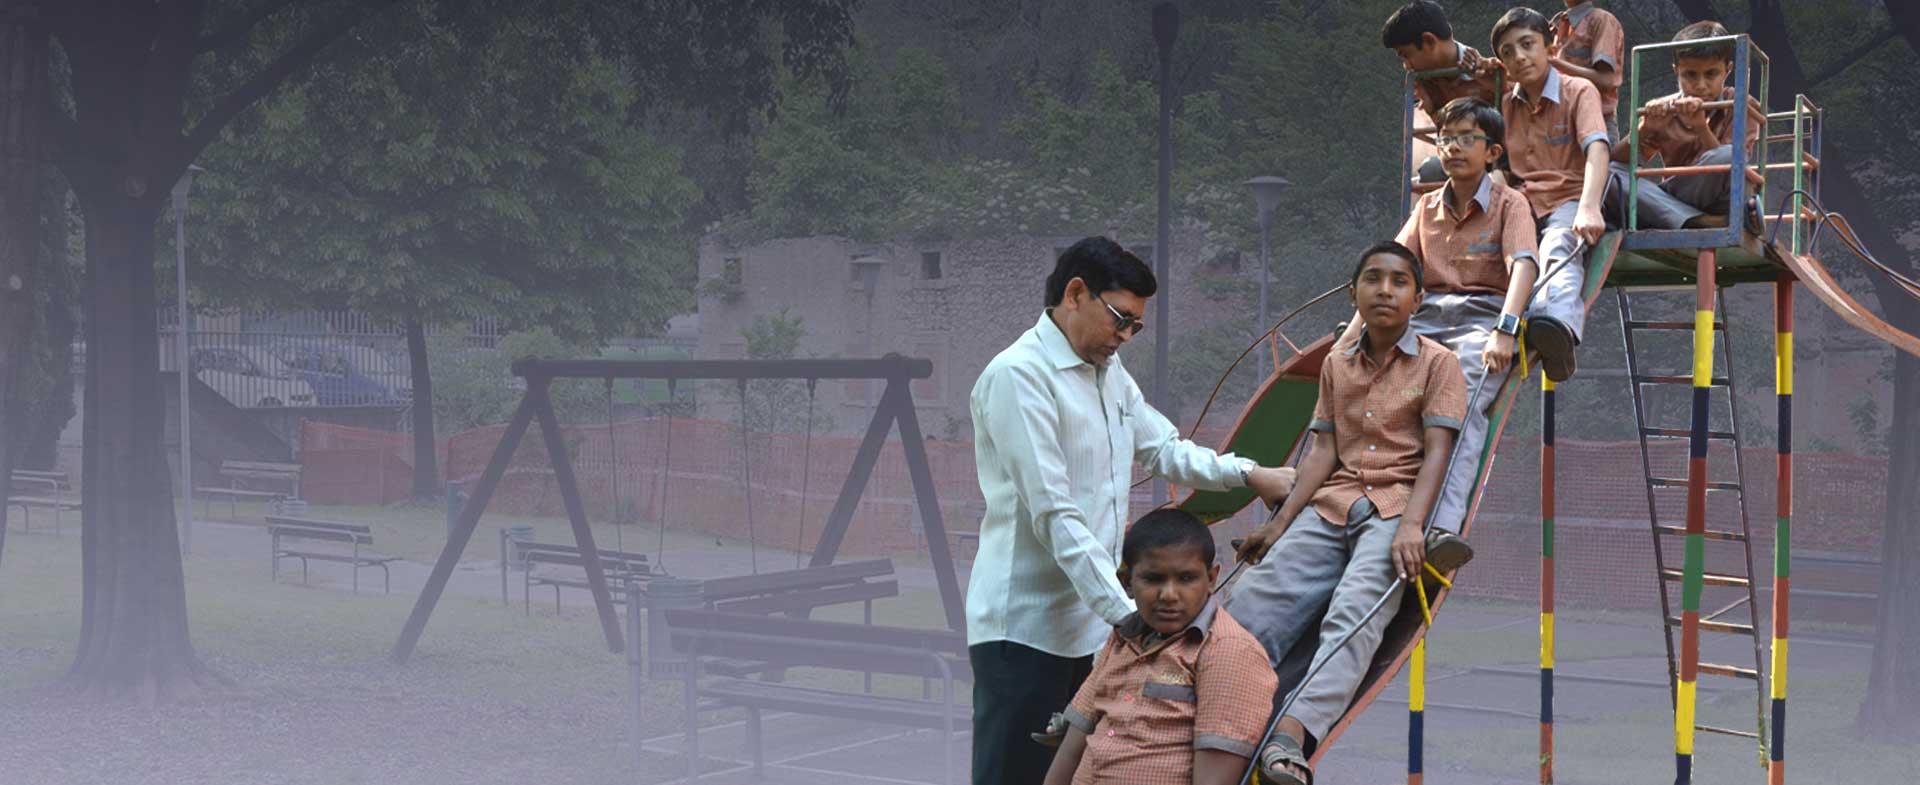 labhubhai-t-sonani-with-blind-children-in-park